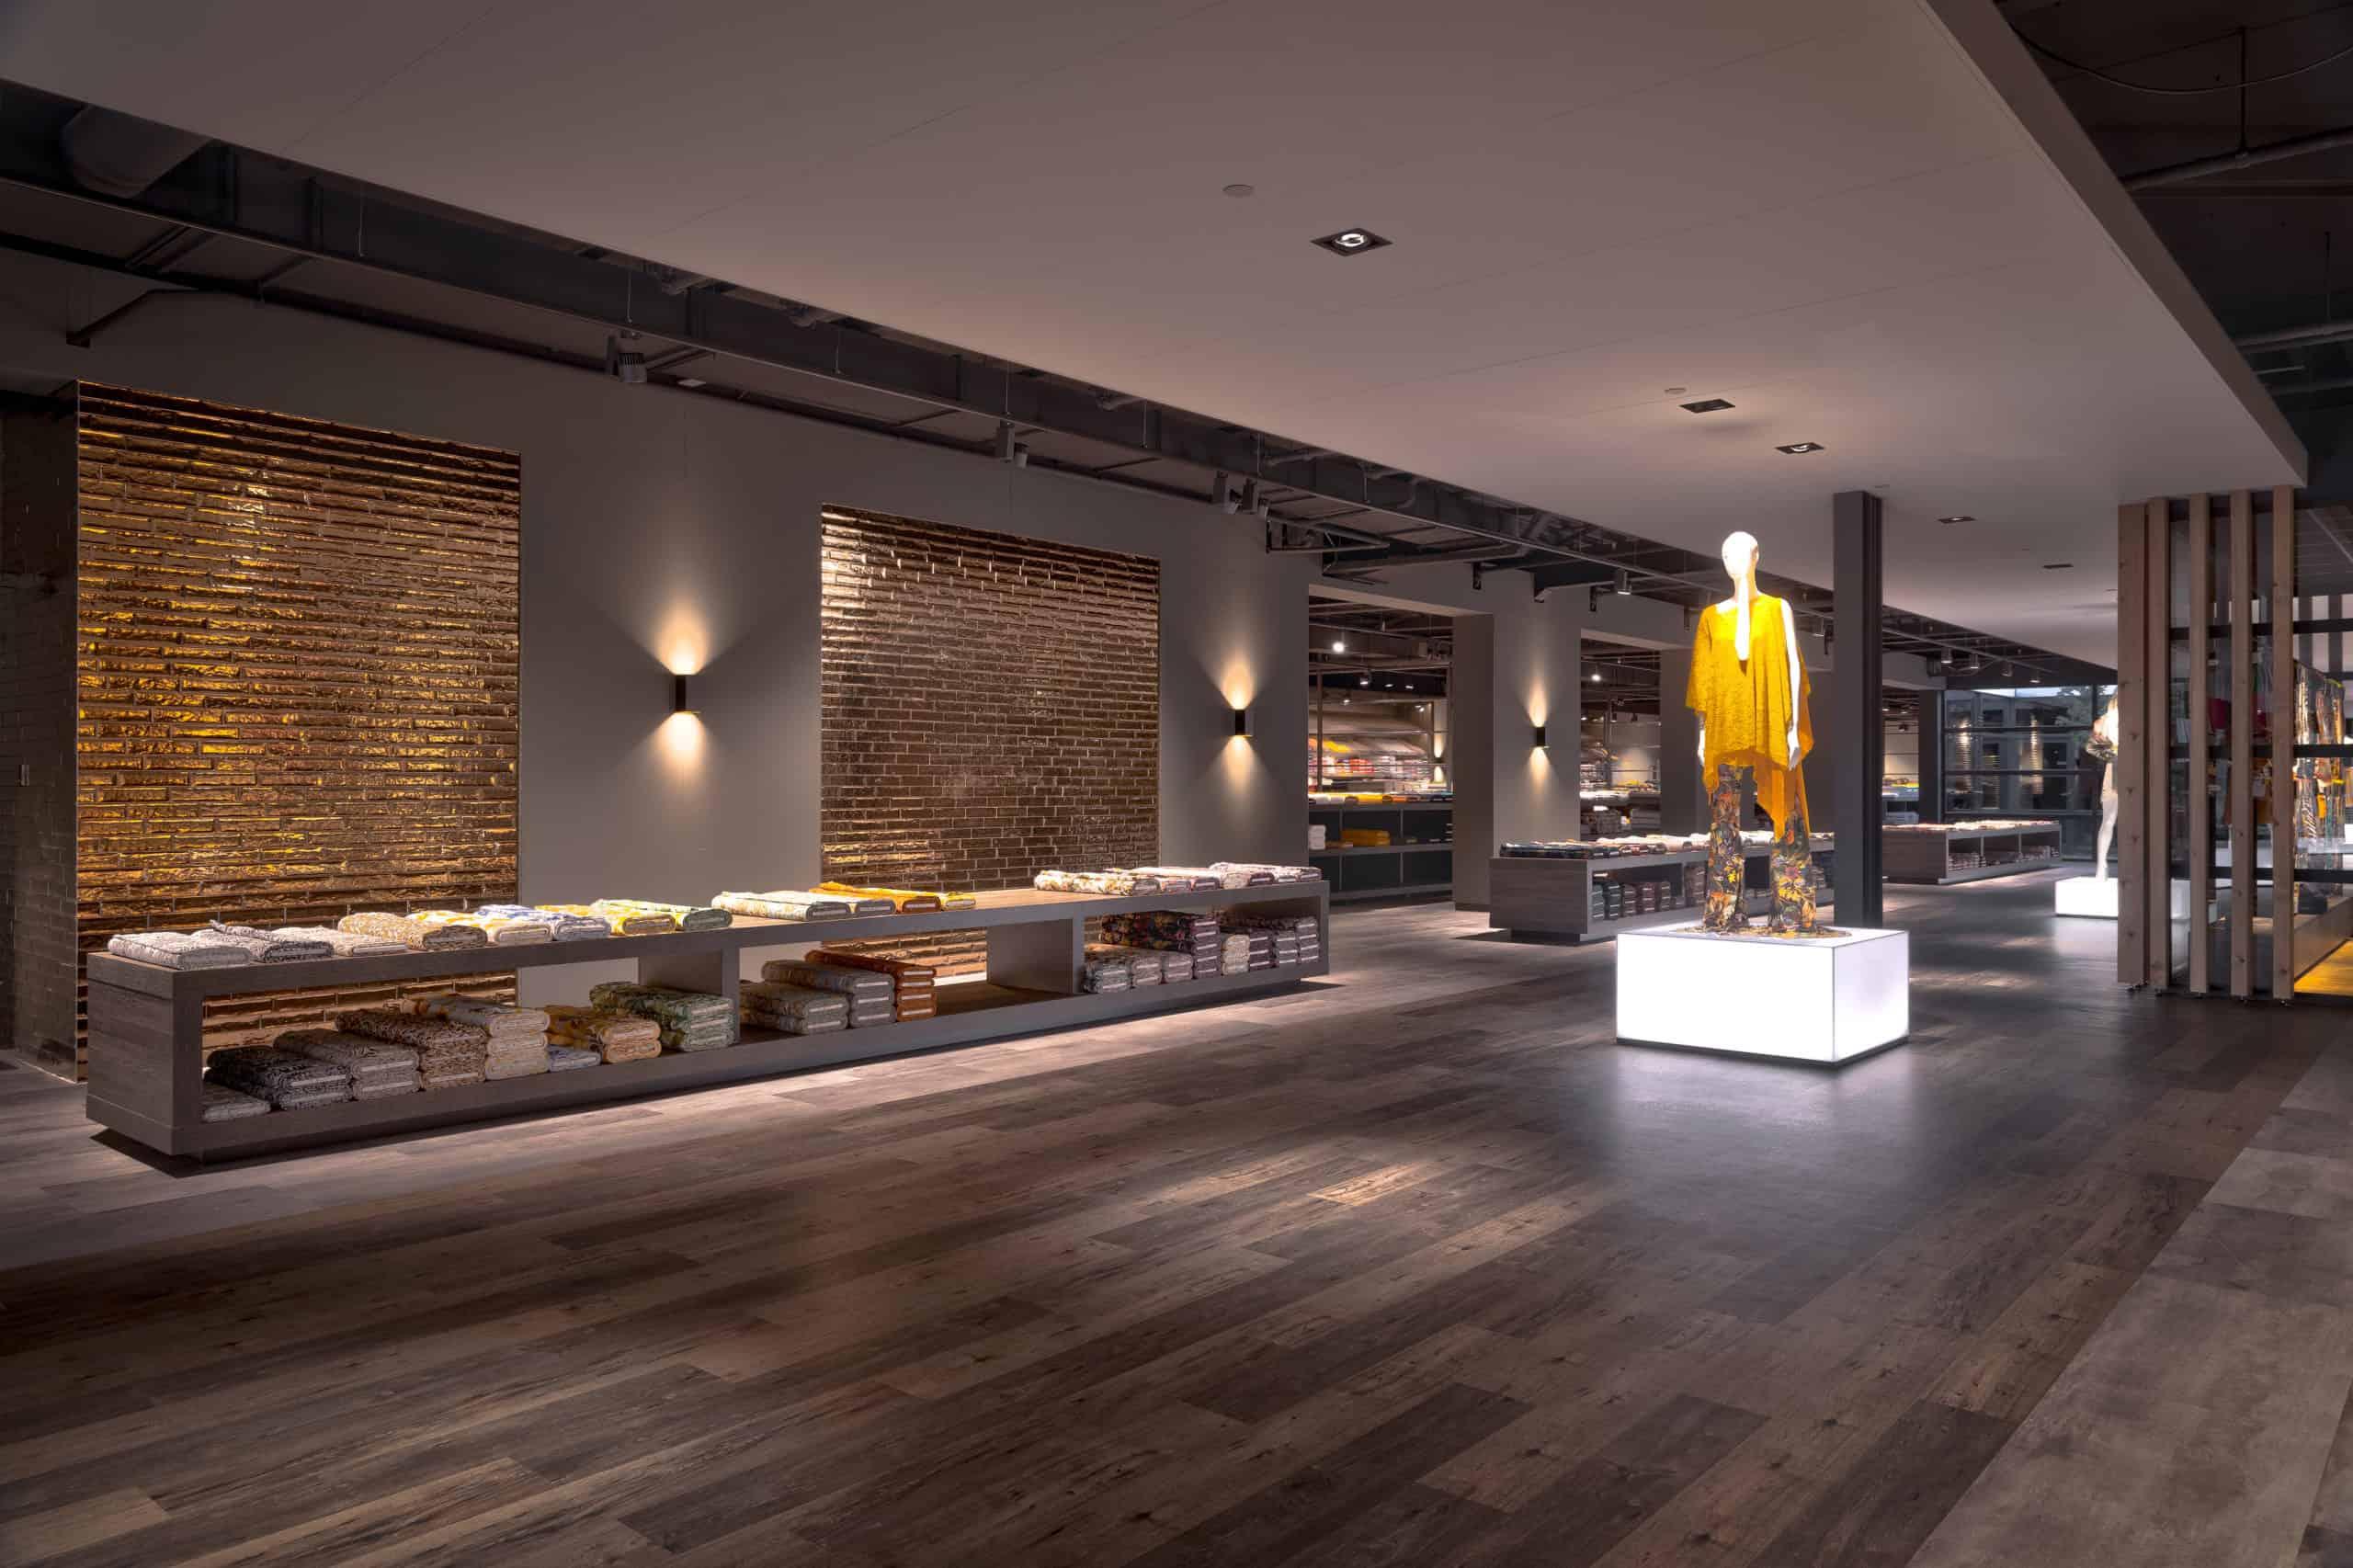 interieurarchitect Wildenberg ontwerp showroom Knipidee Almere tegelwand wsb maretti iboma kerastone objectflor tarkett kopie